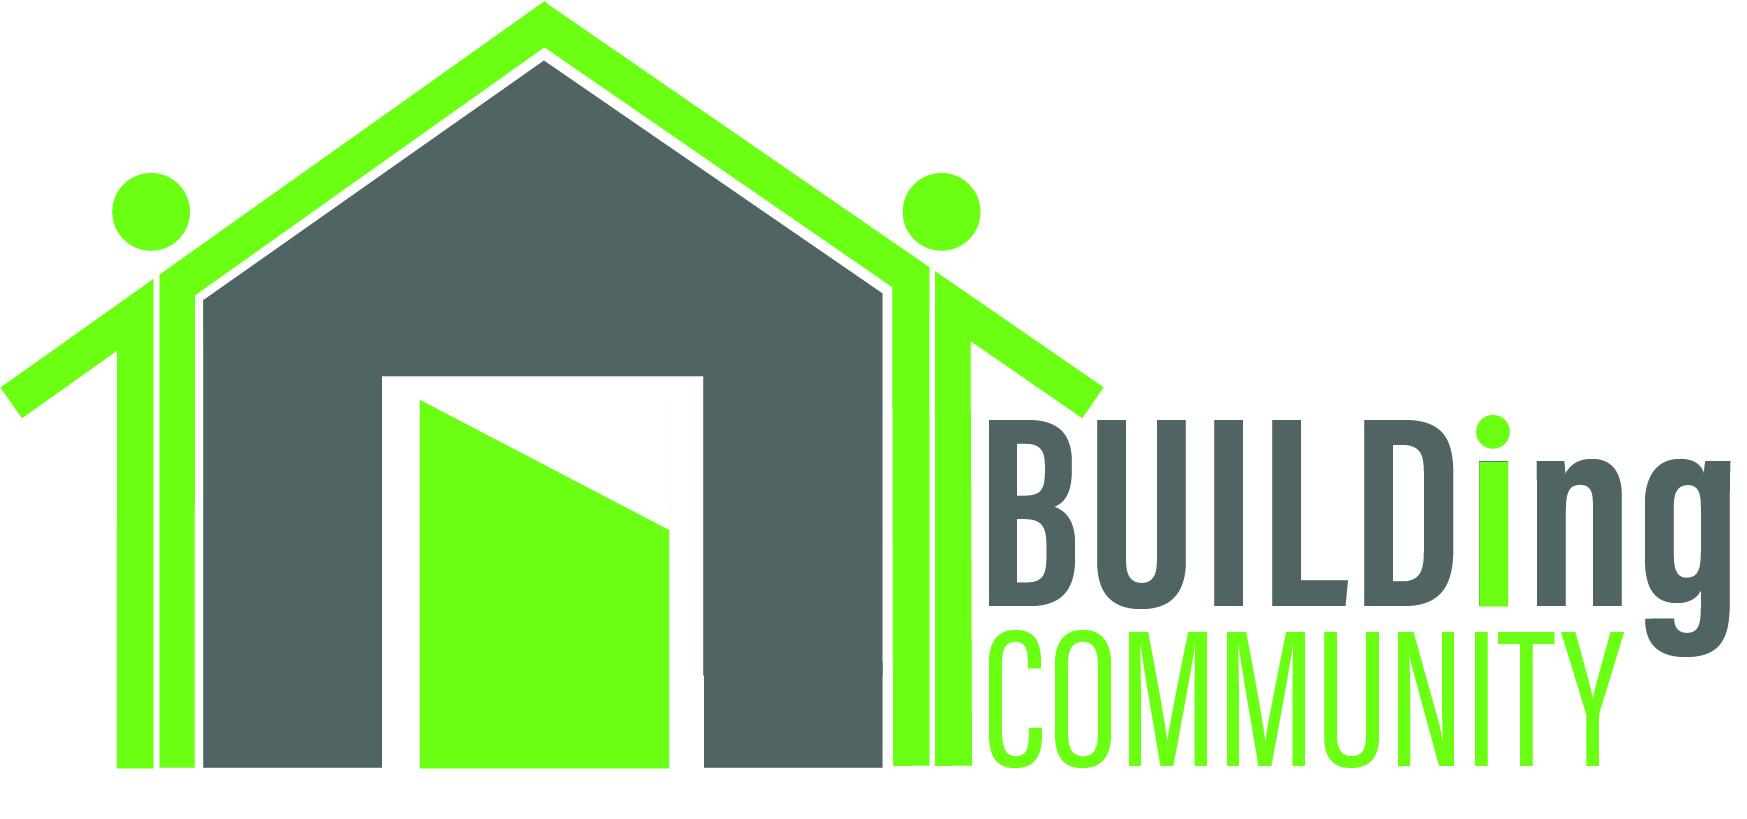 LDBR_BUILDing Community Child Brand_FINAL